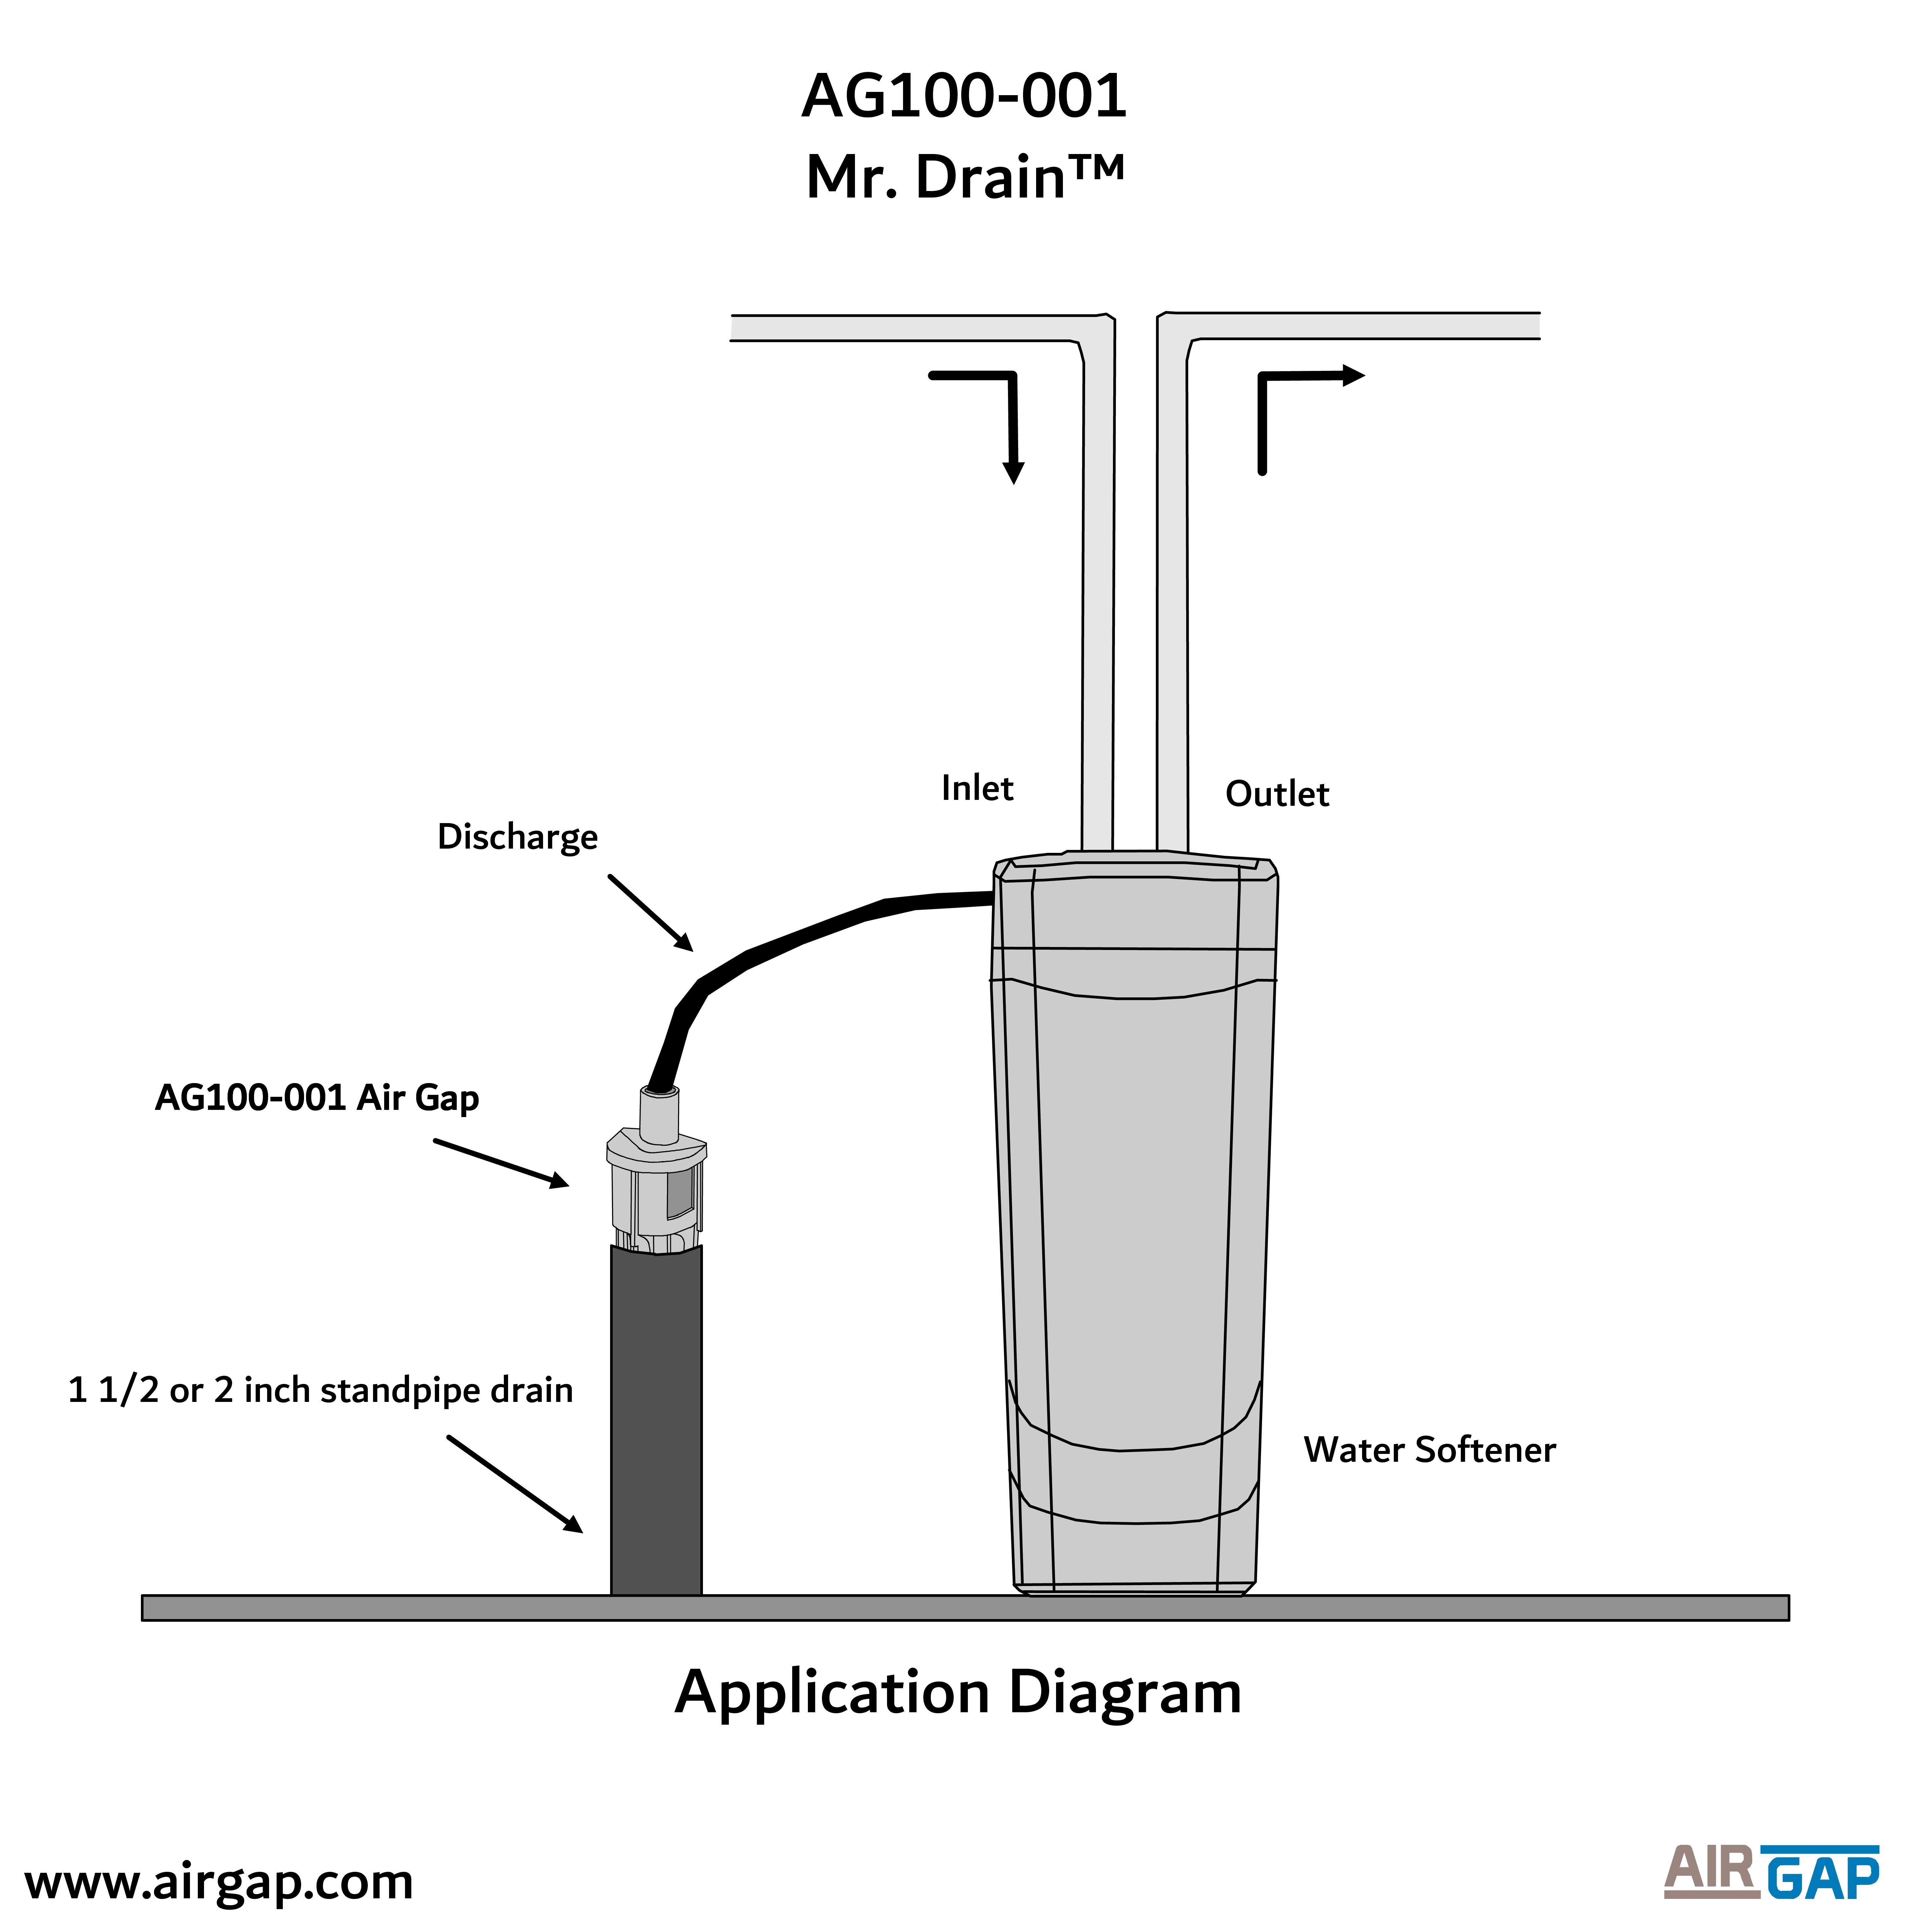 dishwasher air gap installation diagram wiring toyota kijang 5k mr drain water softener airgap international